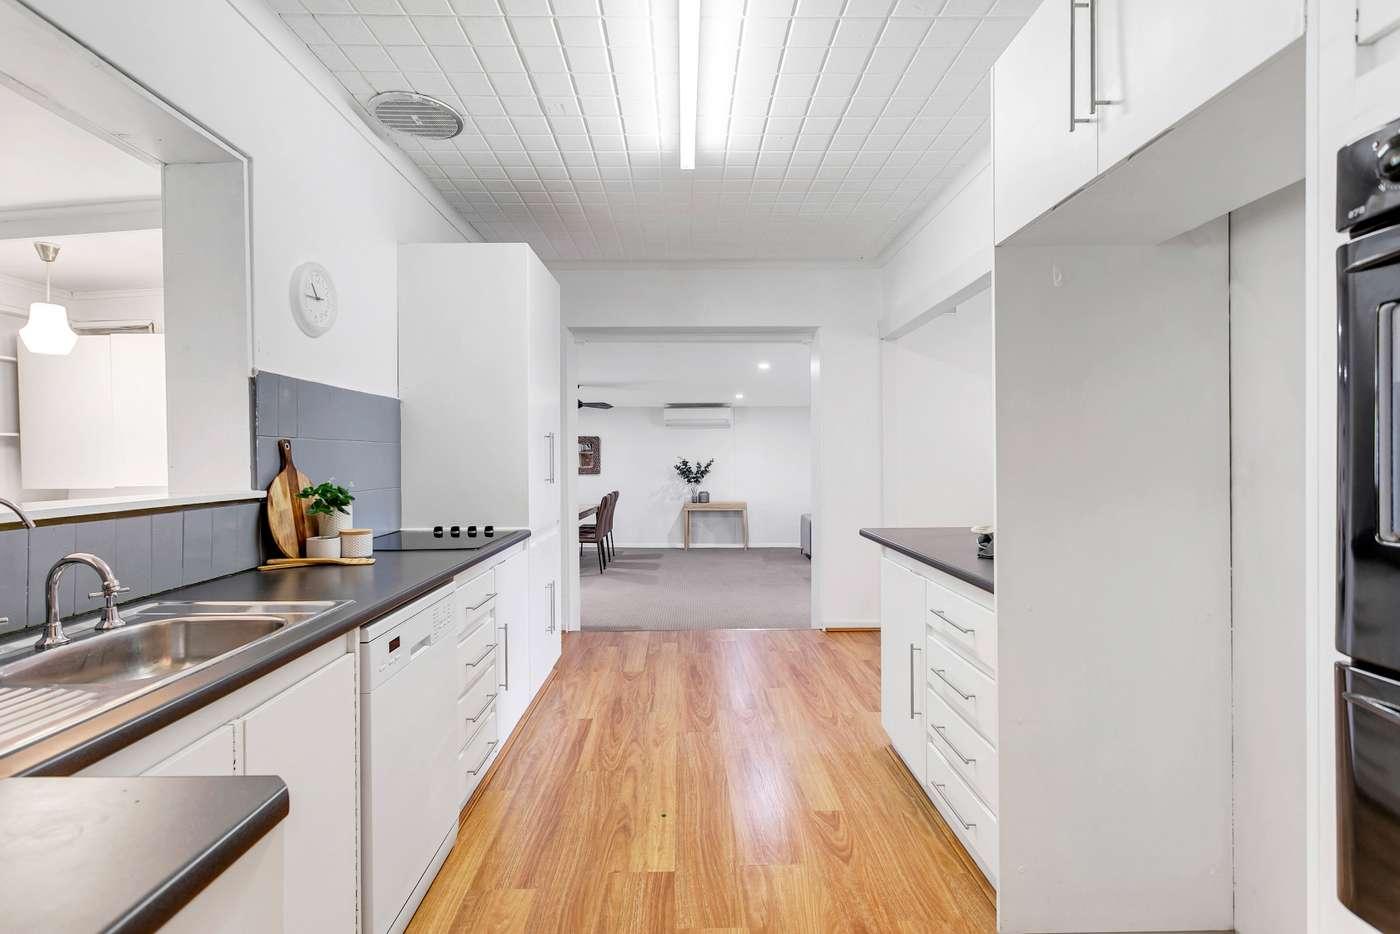 Main view of Homely house listing, 1 Emerald Road, Morphett Vale SA 5162